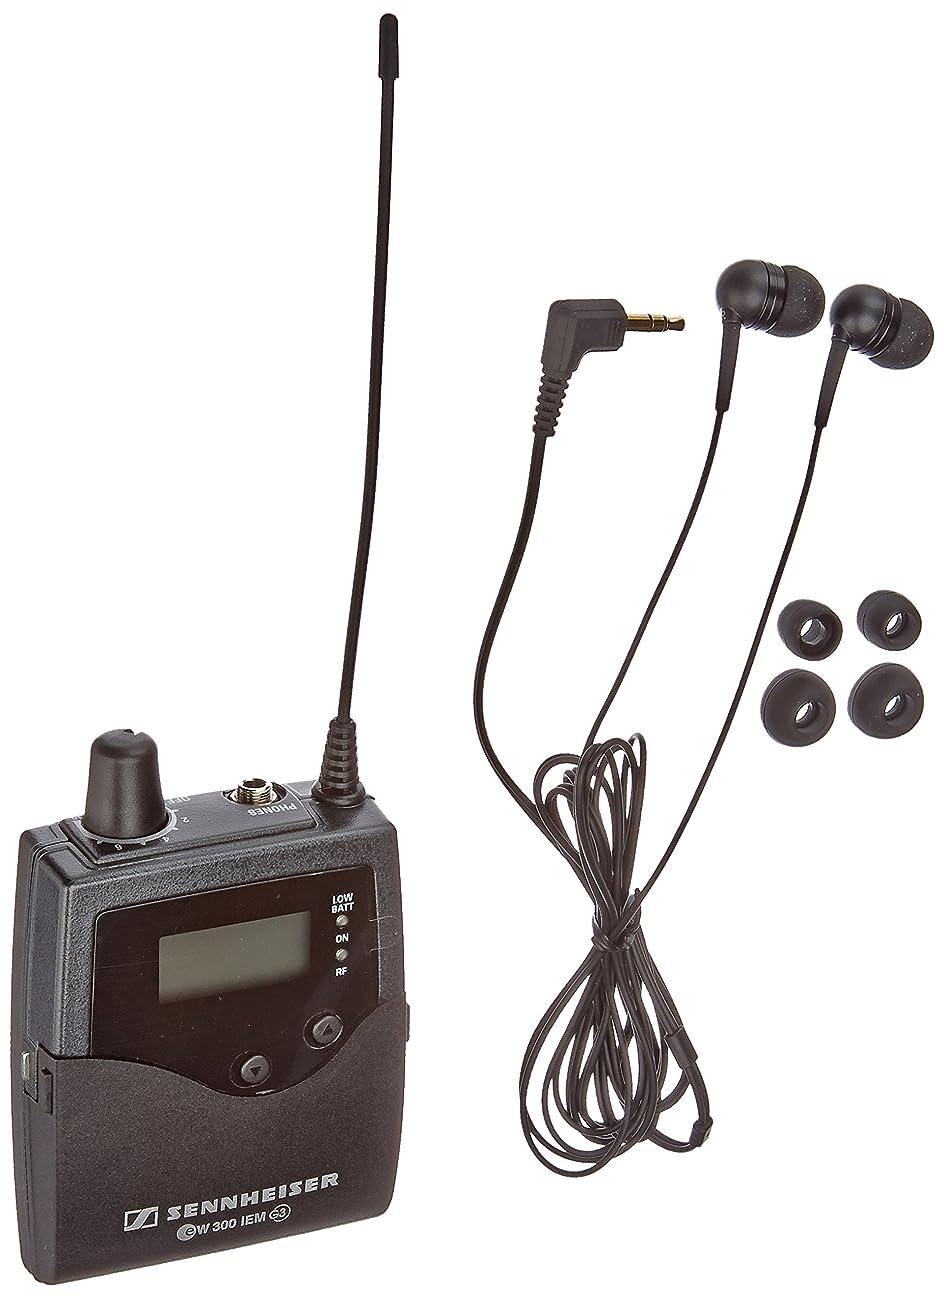 Sennheiser Ek 300Iem G3 - Diversity Bodypack Receiver with IE4 Ear Buds For Wireless Monitoring - A Range (516-558 Mhz)